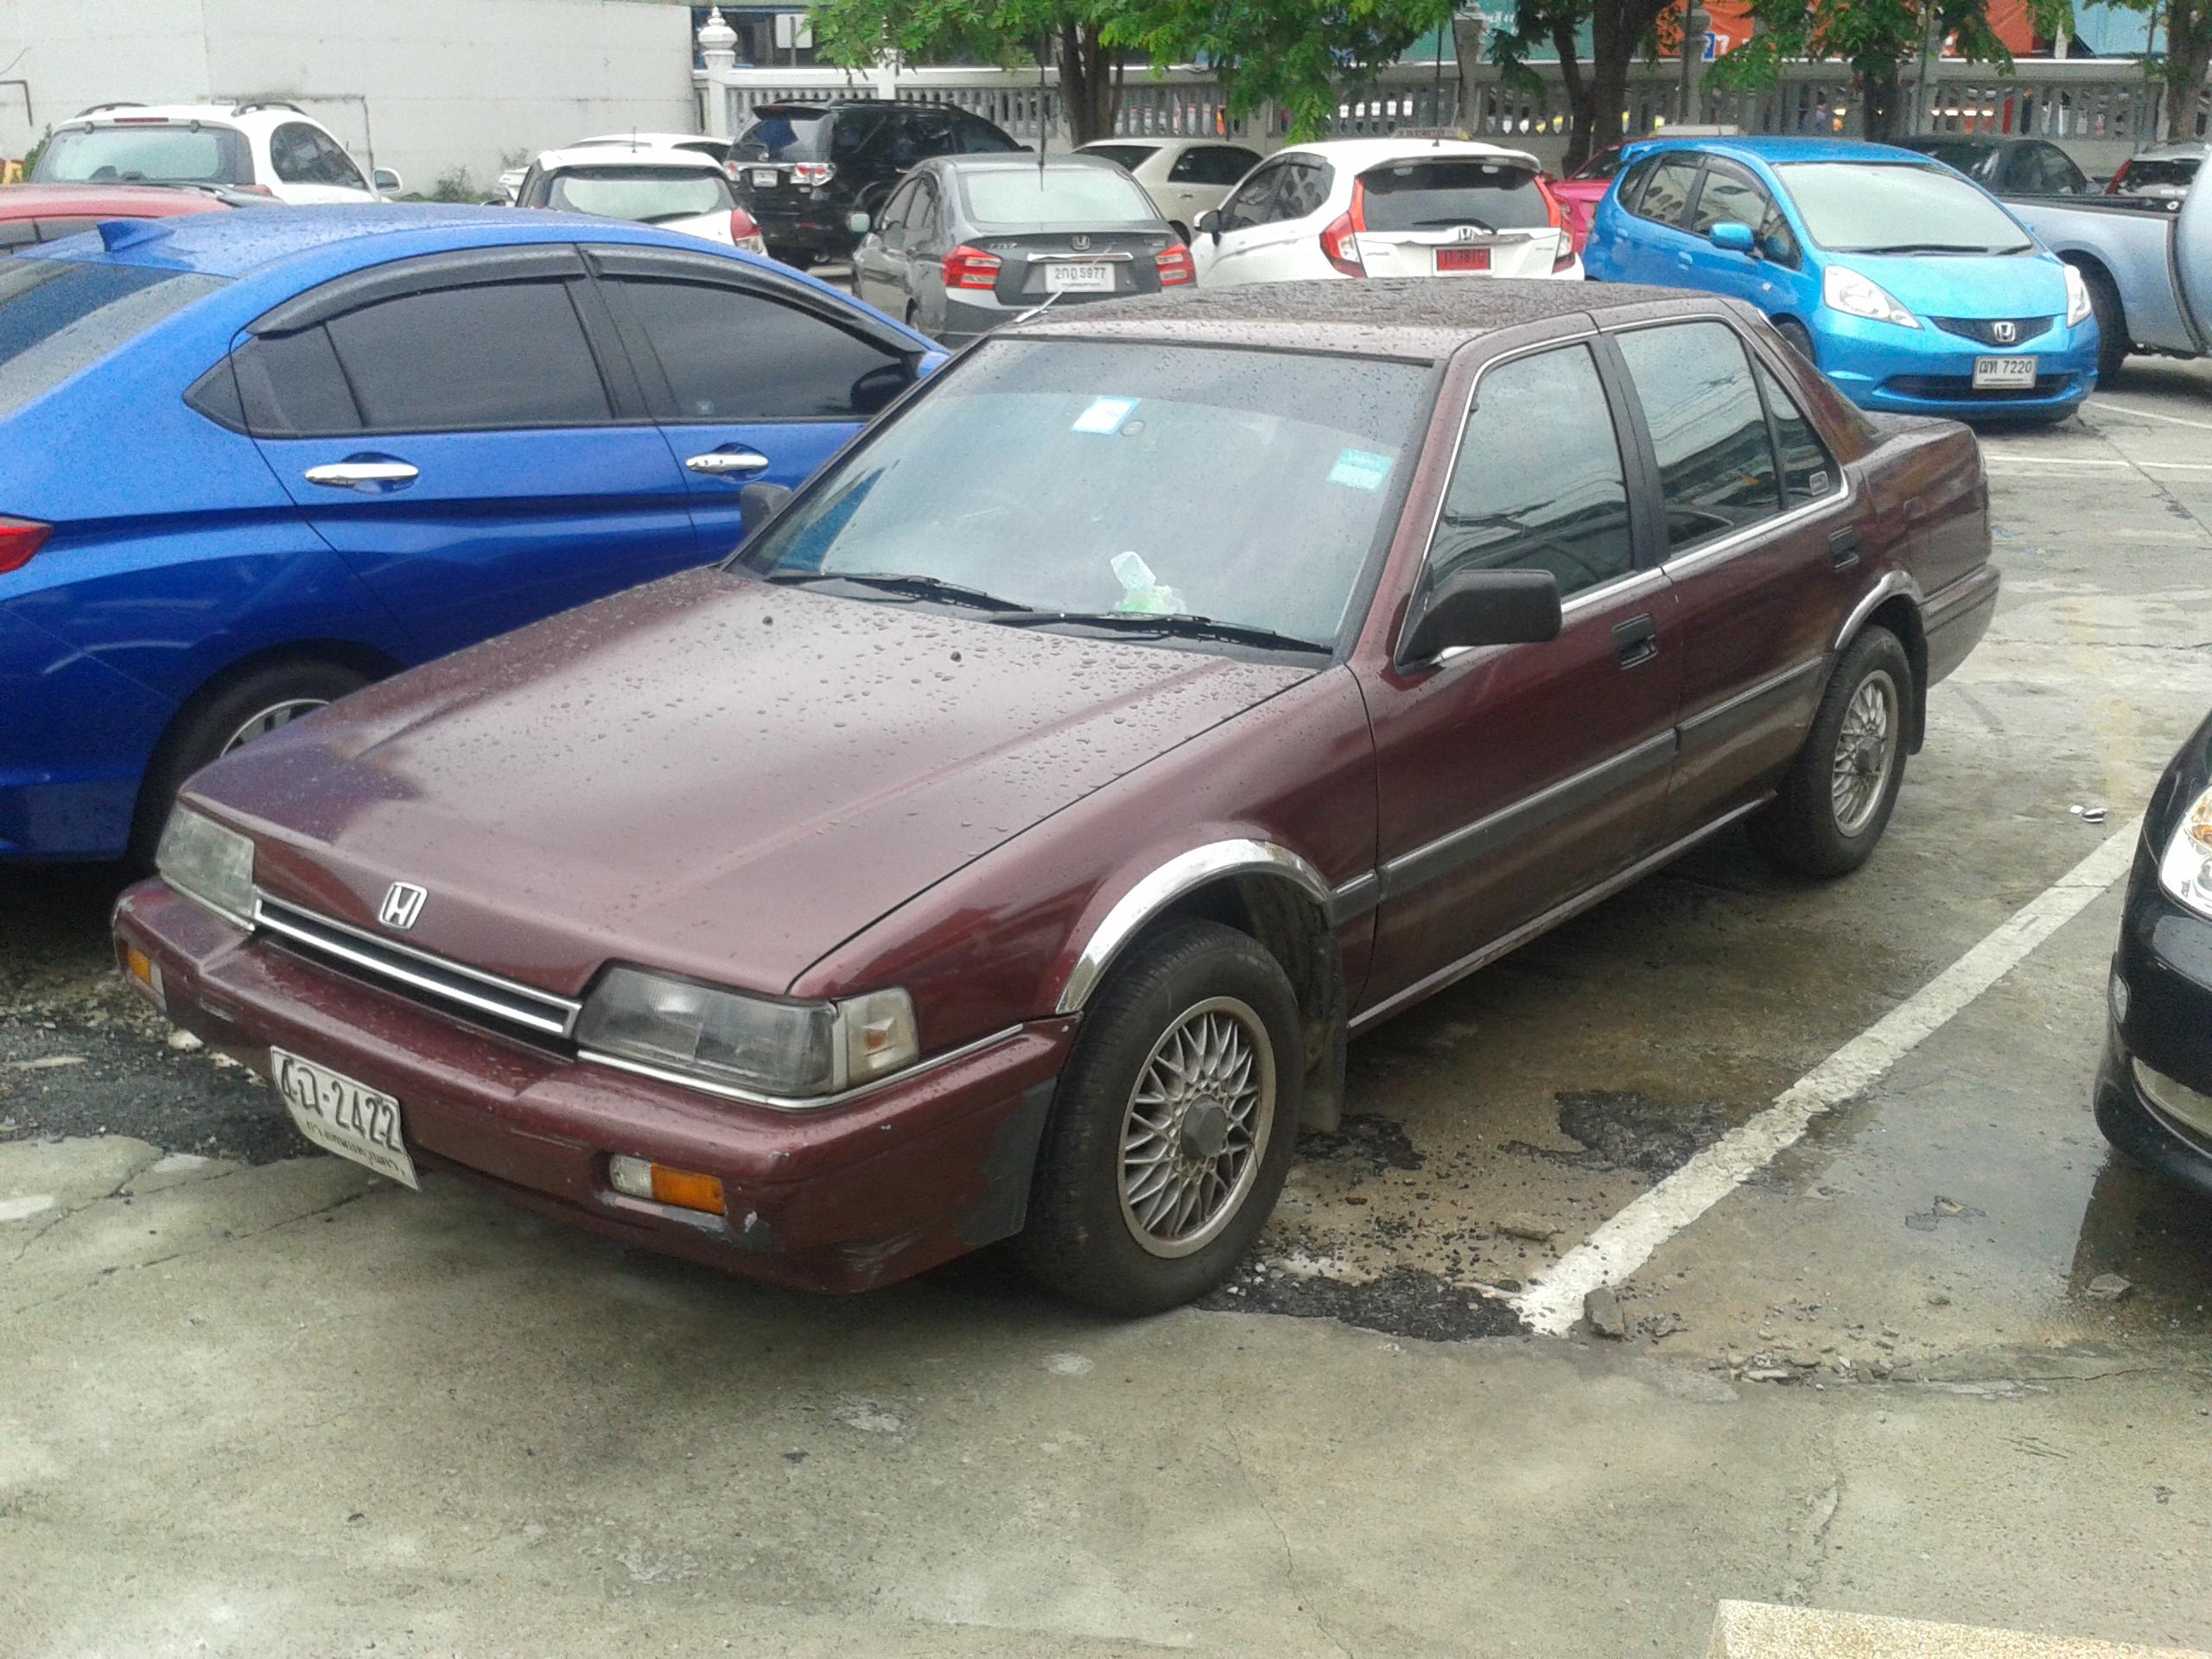 Kelebihan Honda Accord 1986 Murah Berkualitas